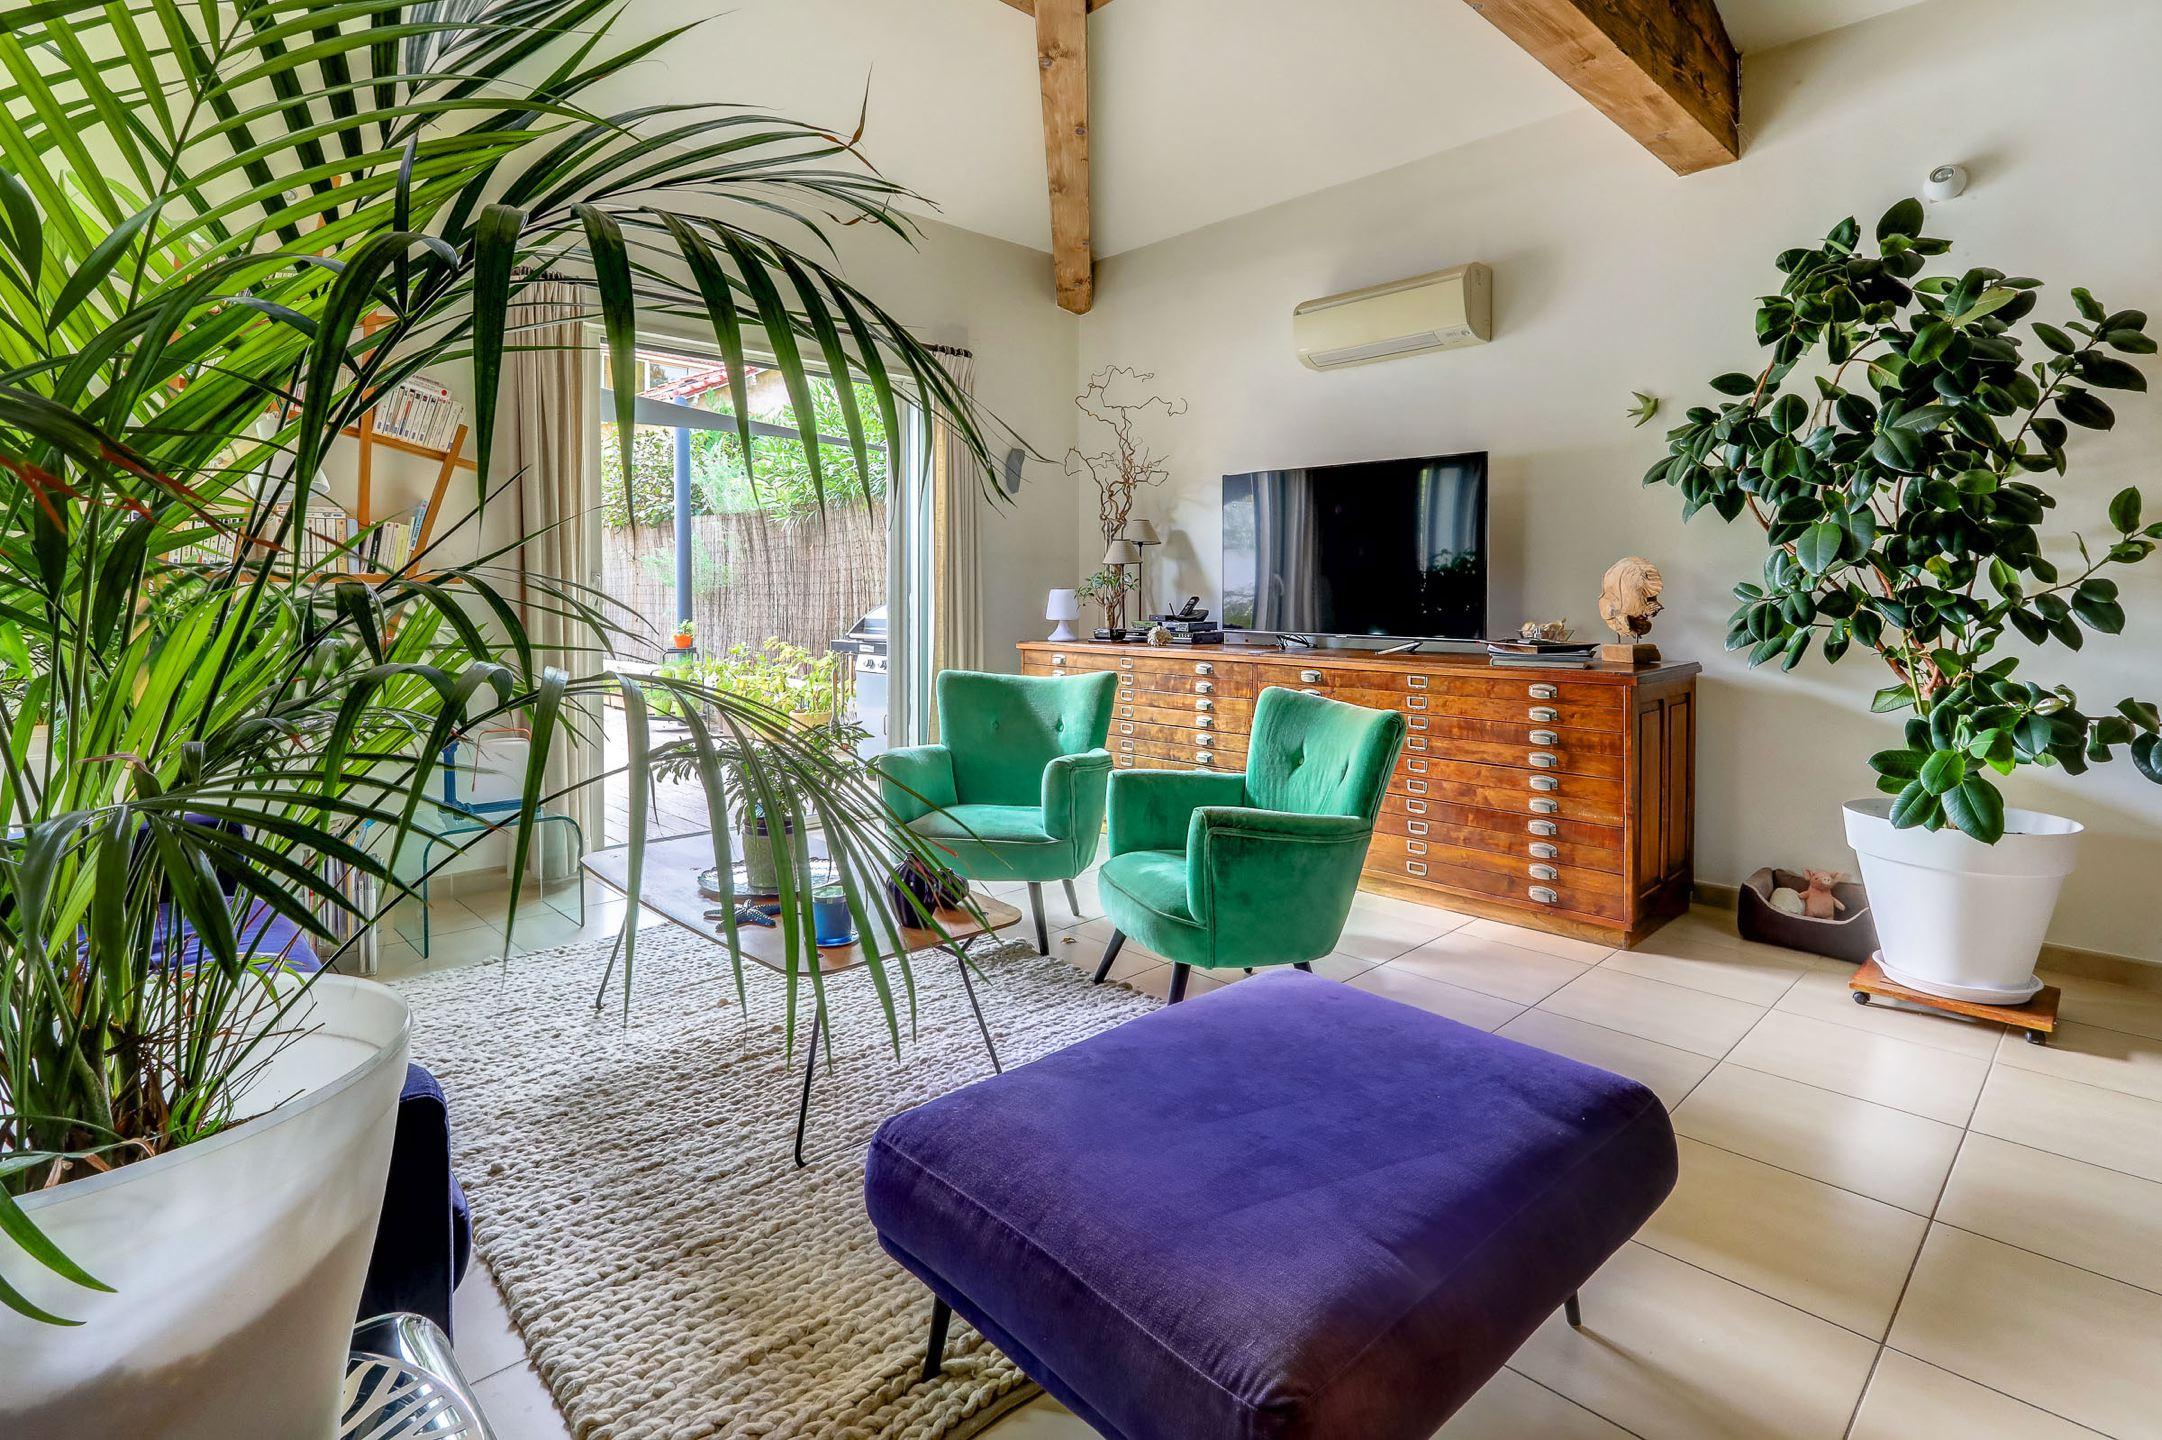 beaumont_13012_villapiscine_teck_contemporaine_terrasse_saintjulien_saintbarnabe_bleuklein_salon2